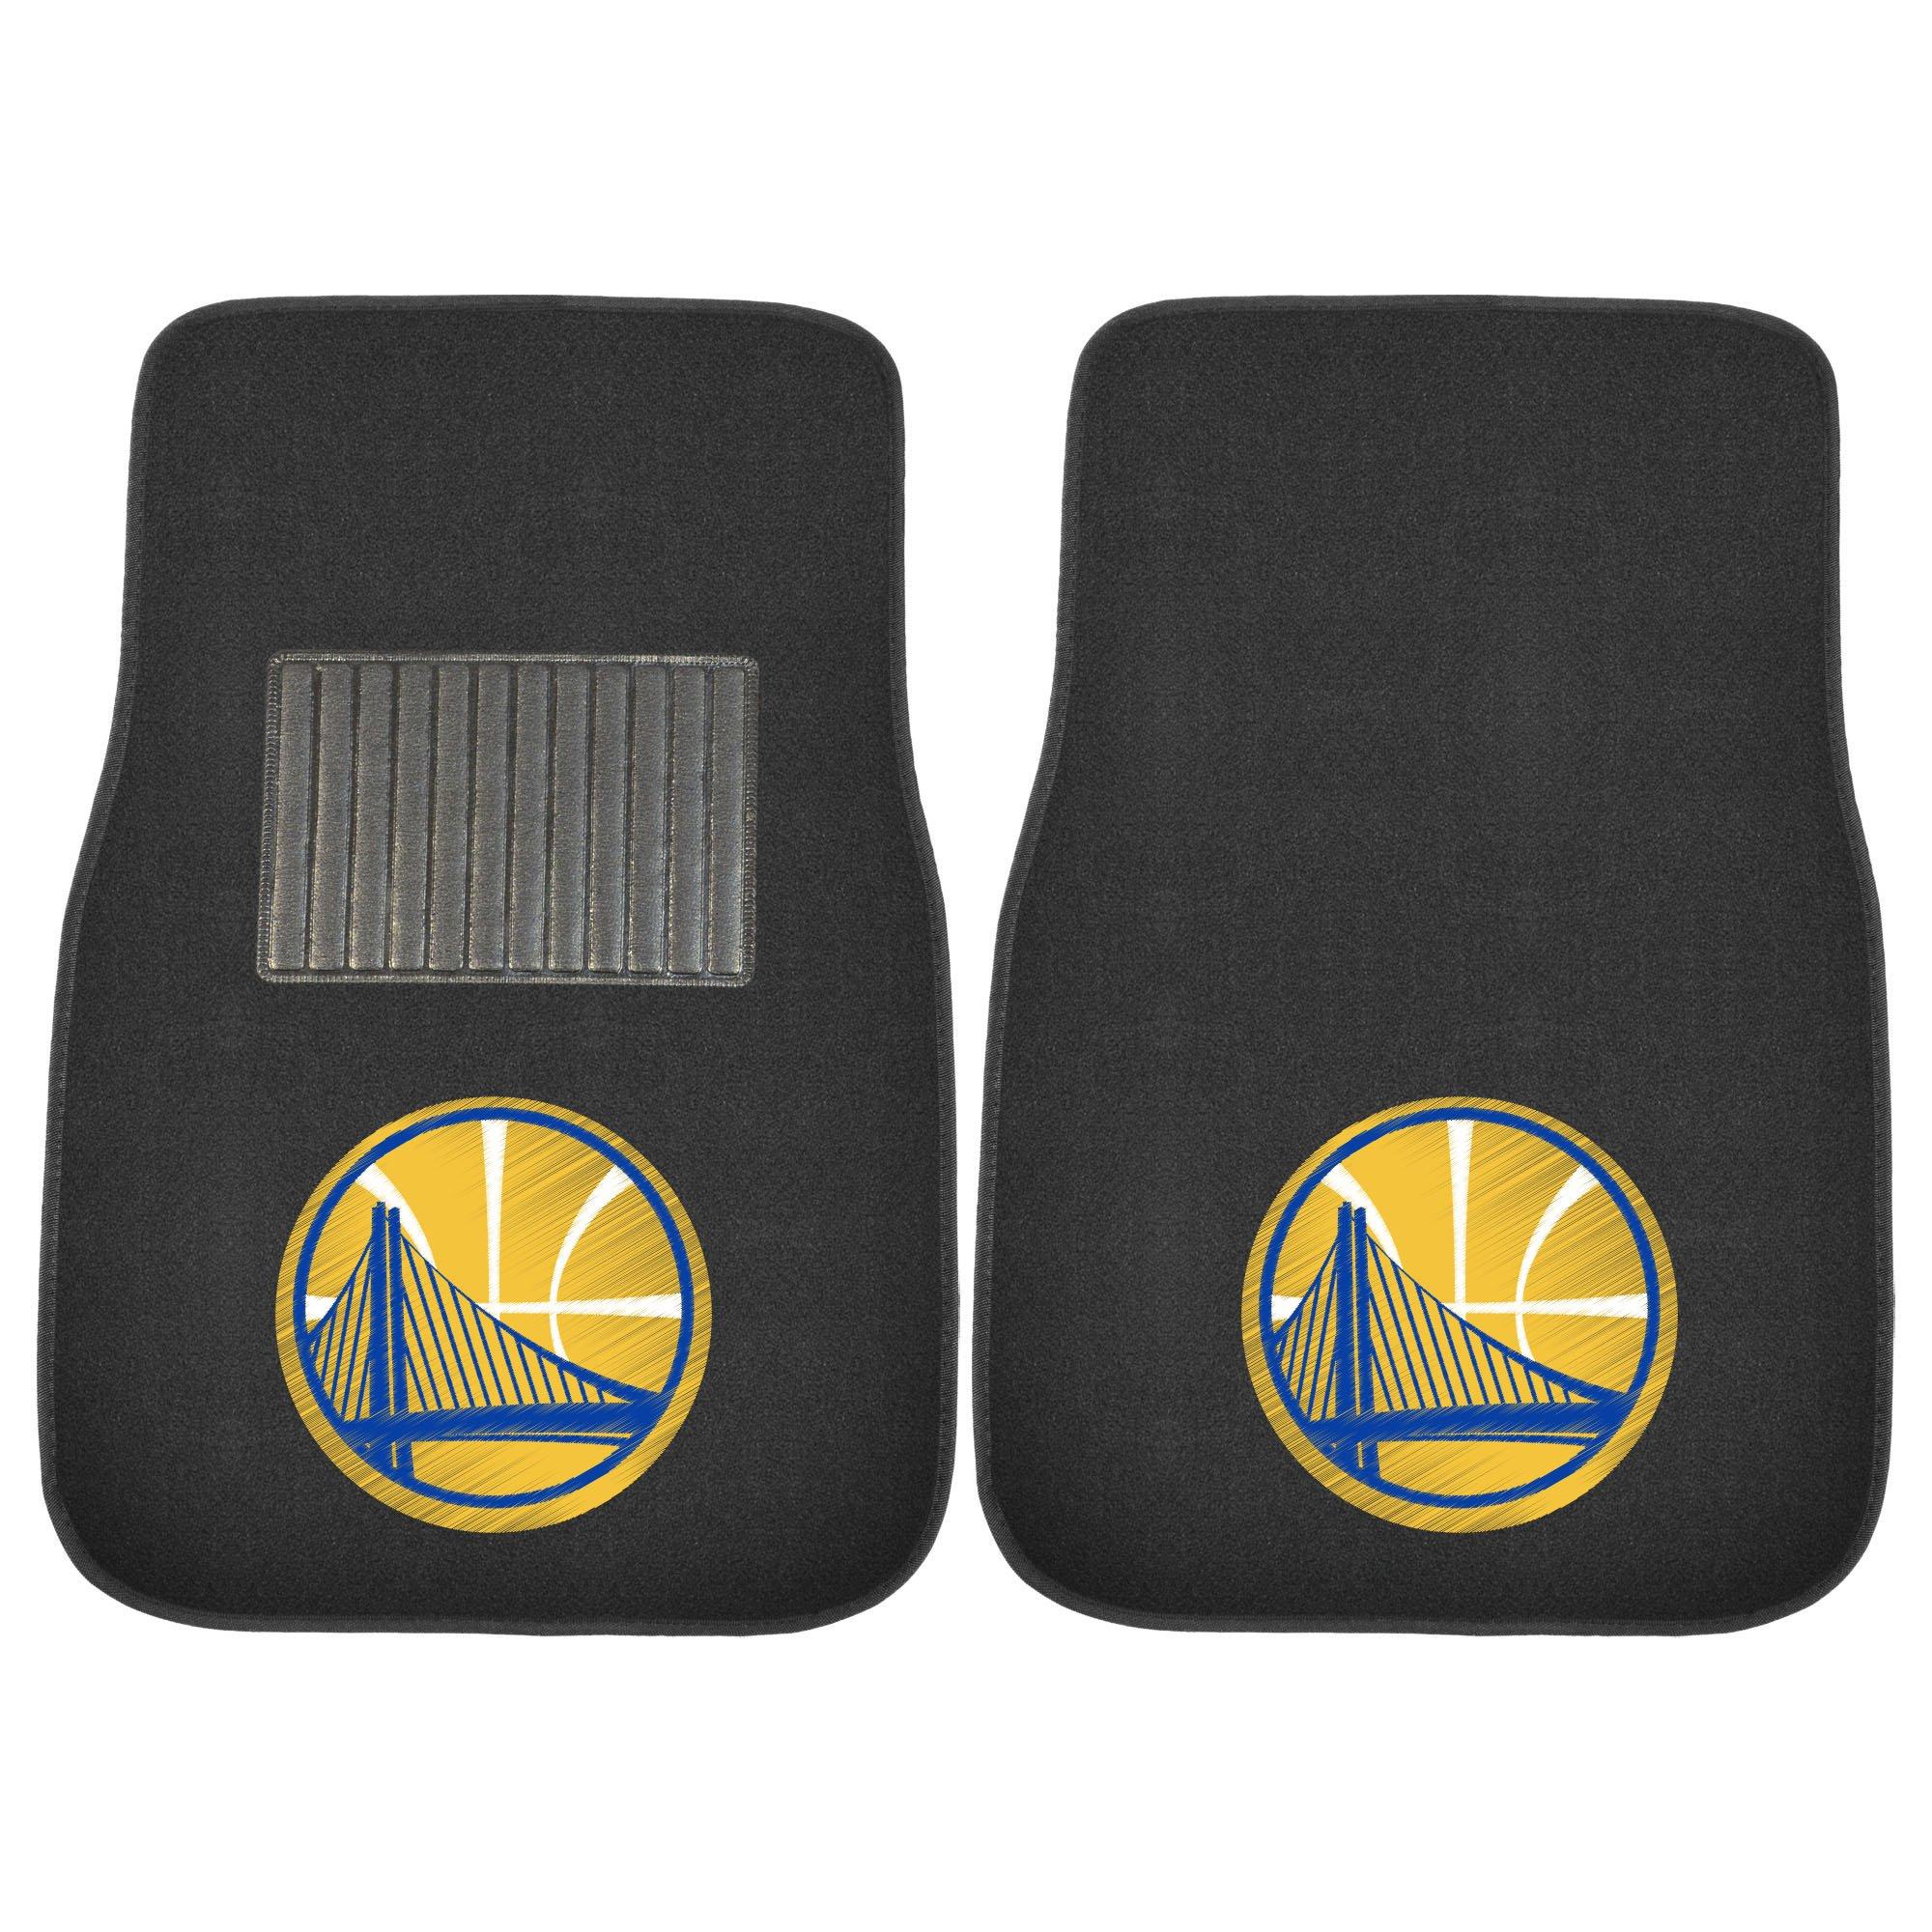 Fanmats 20321 NBA - Golden State Warriors Embroidered Car Mat, Team Color, 17''x25.5''